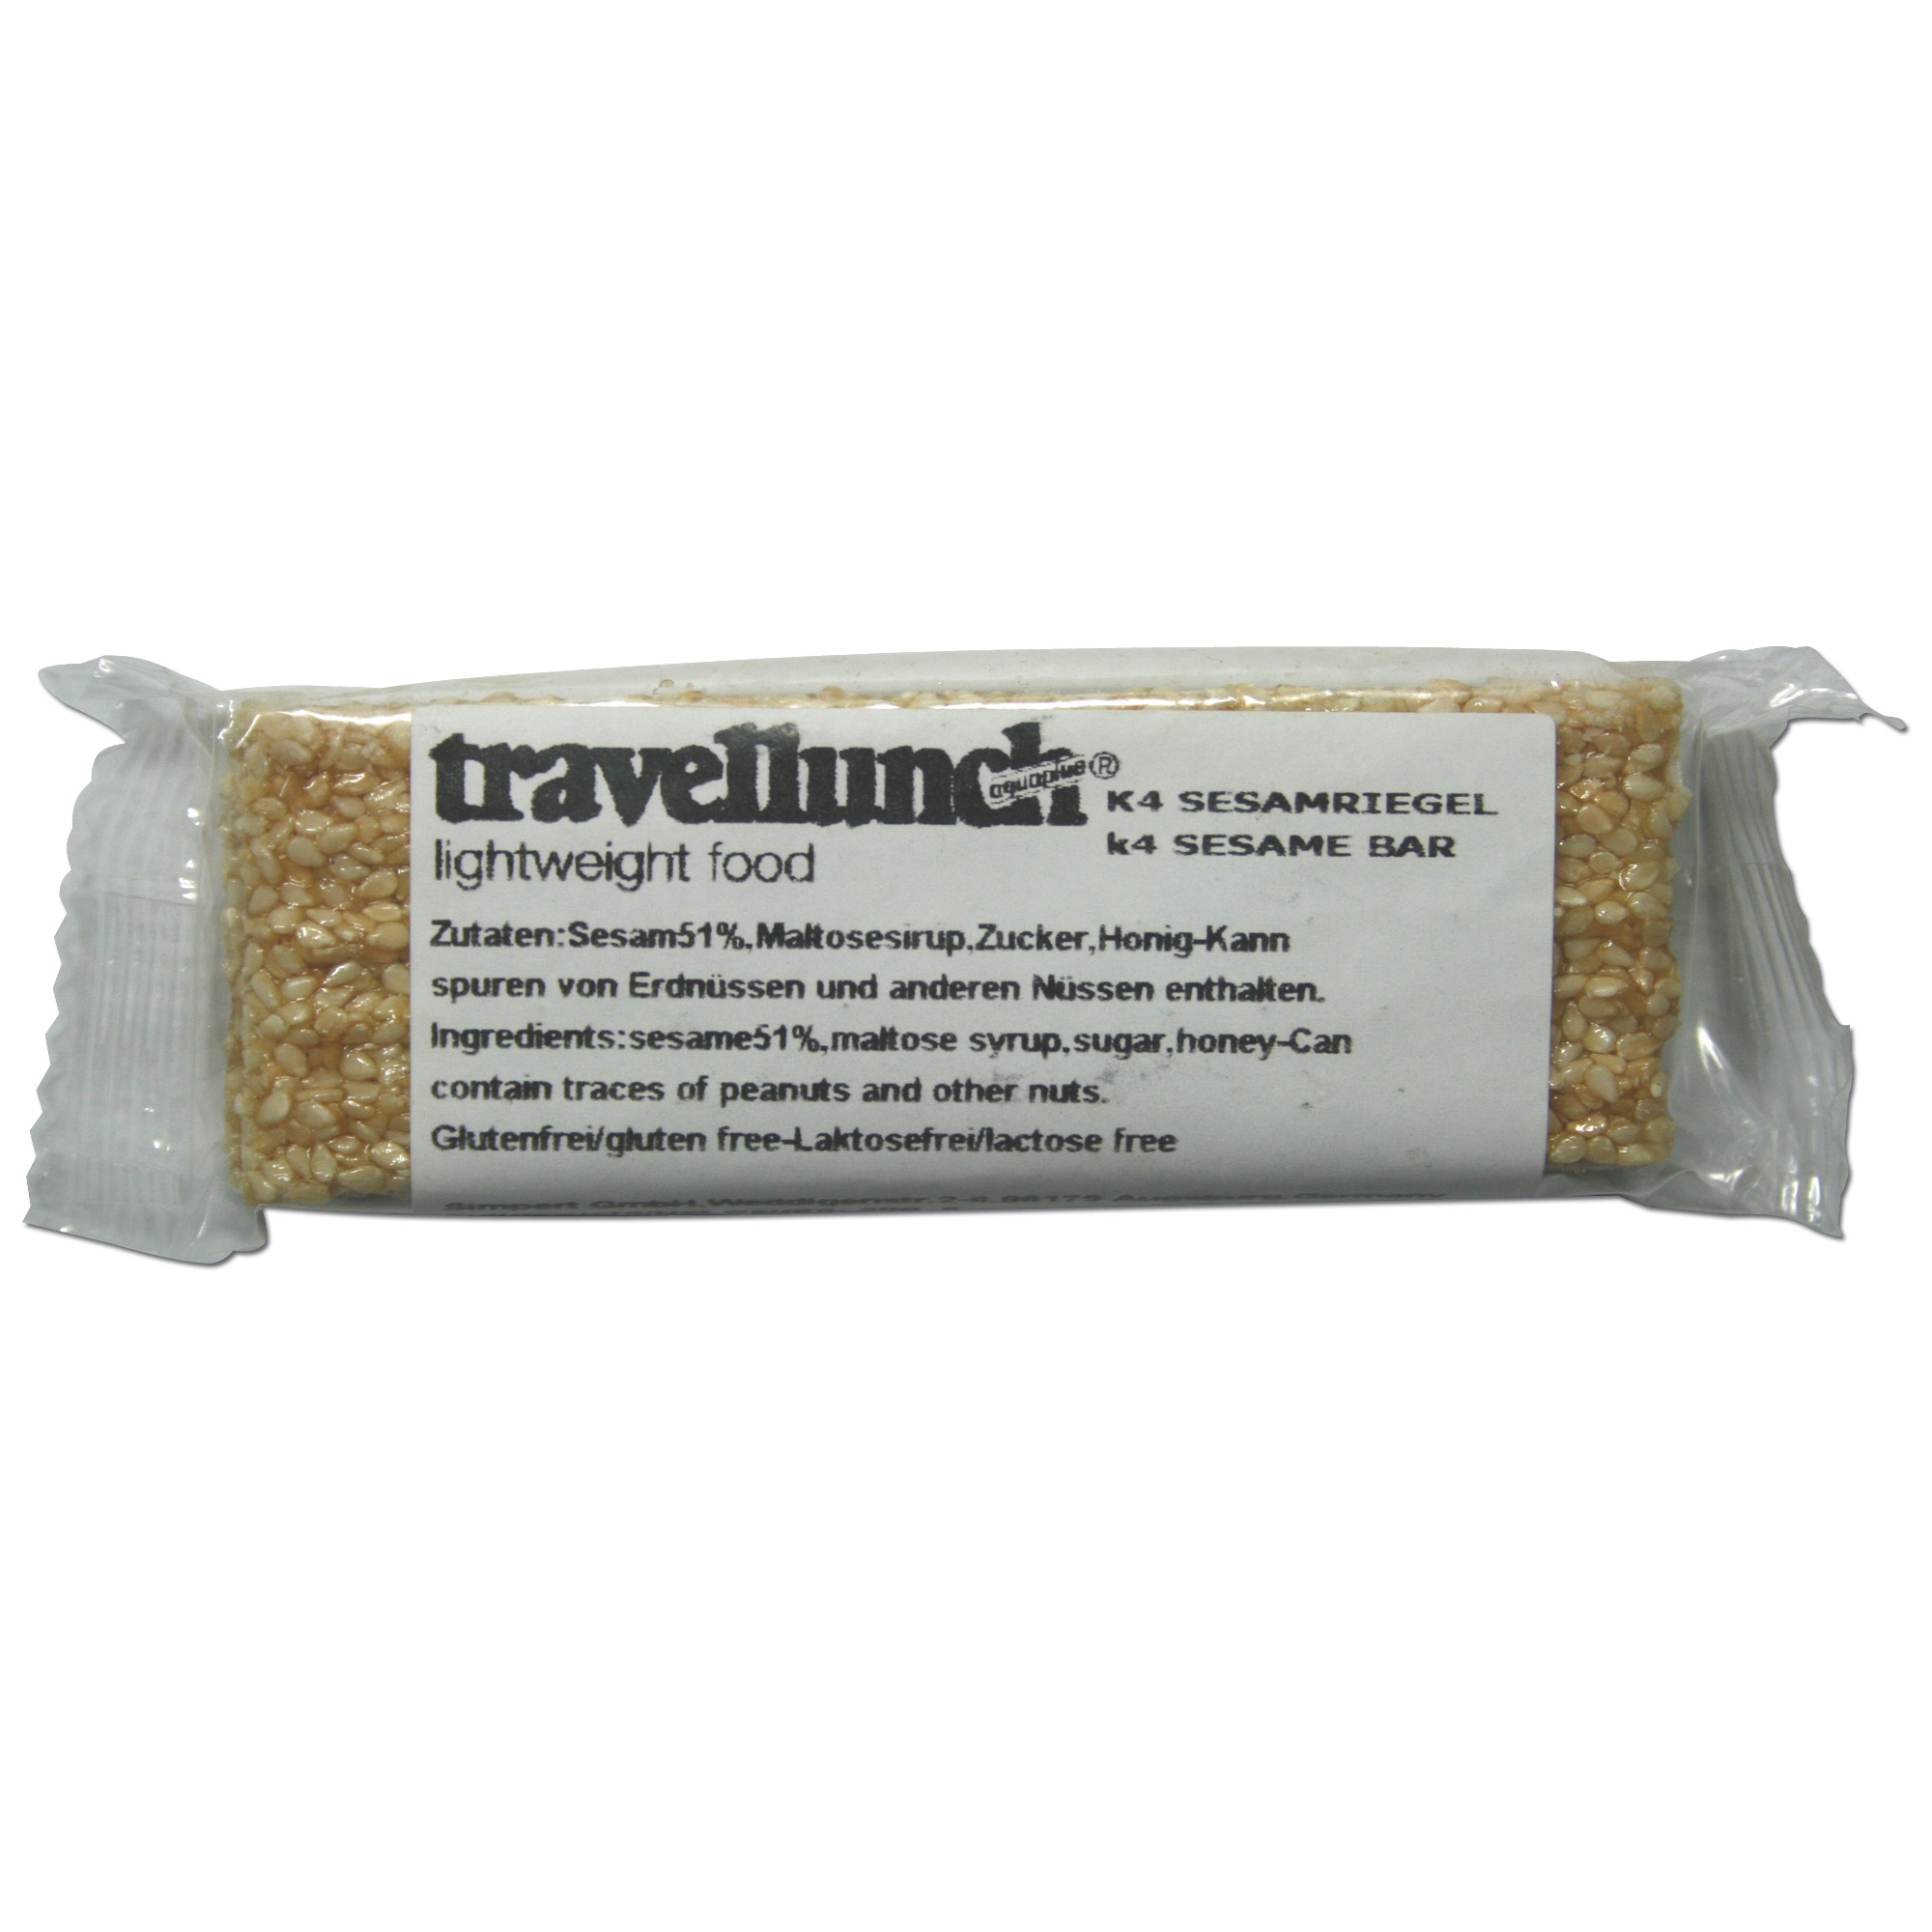 Travellunch K4 Sesamriegel